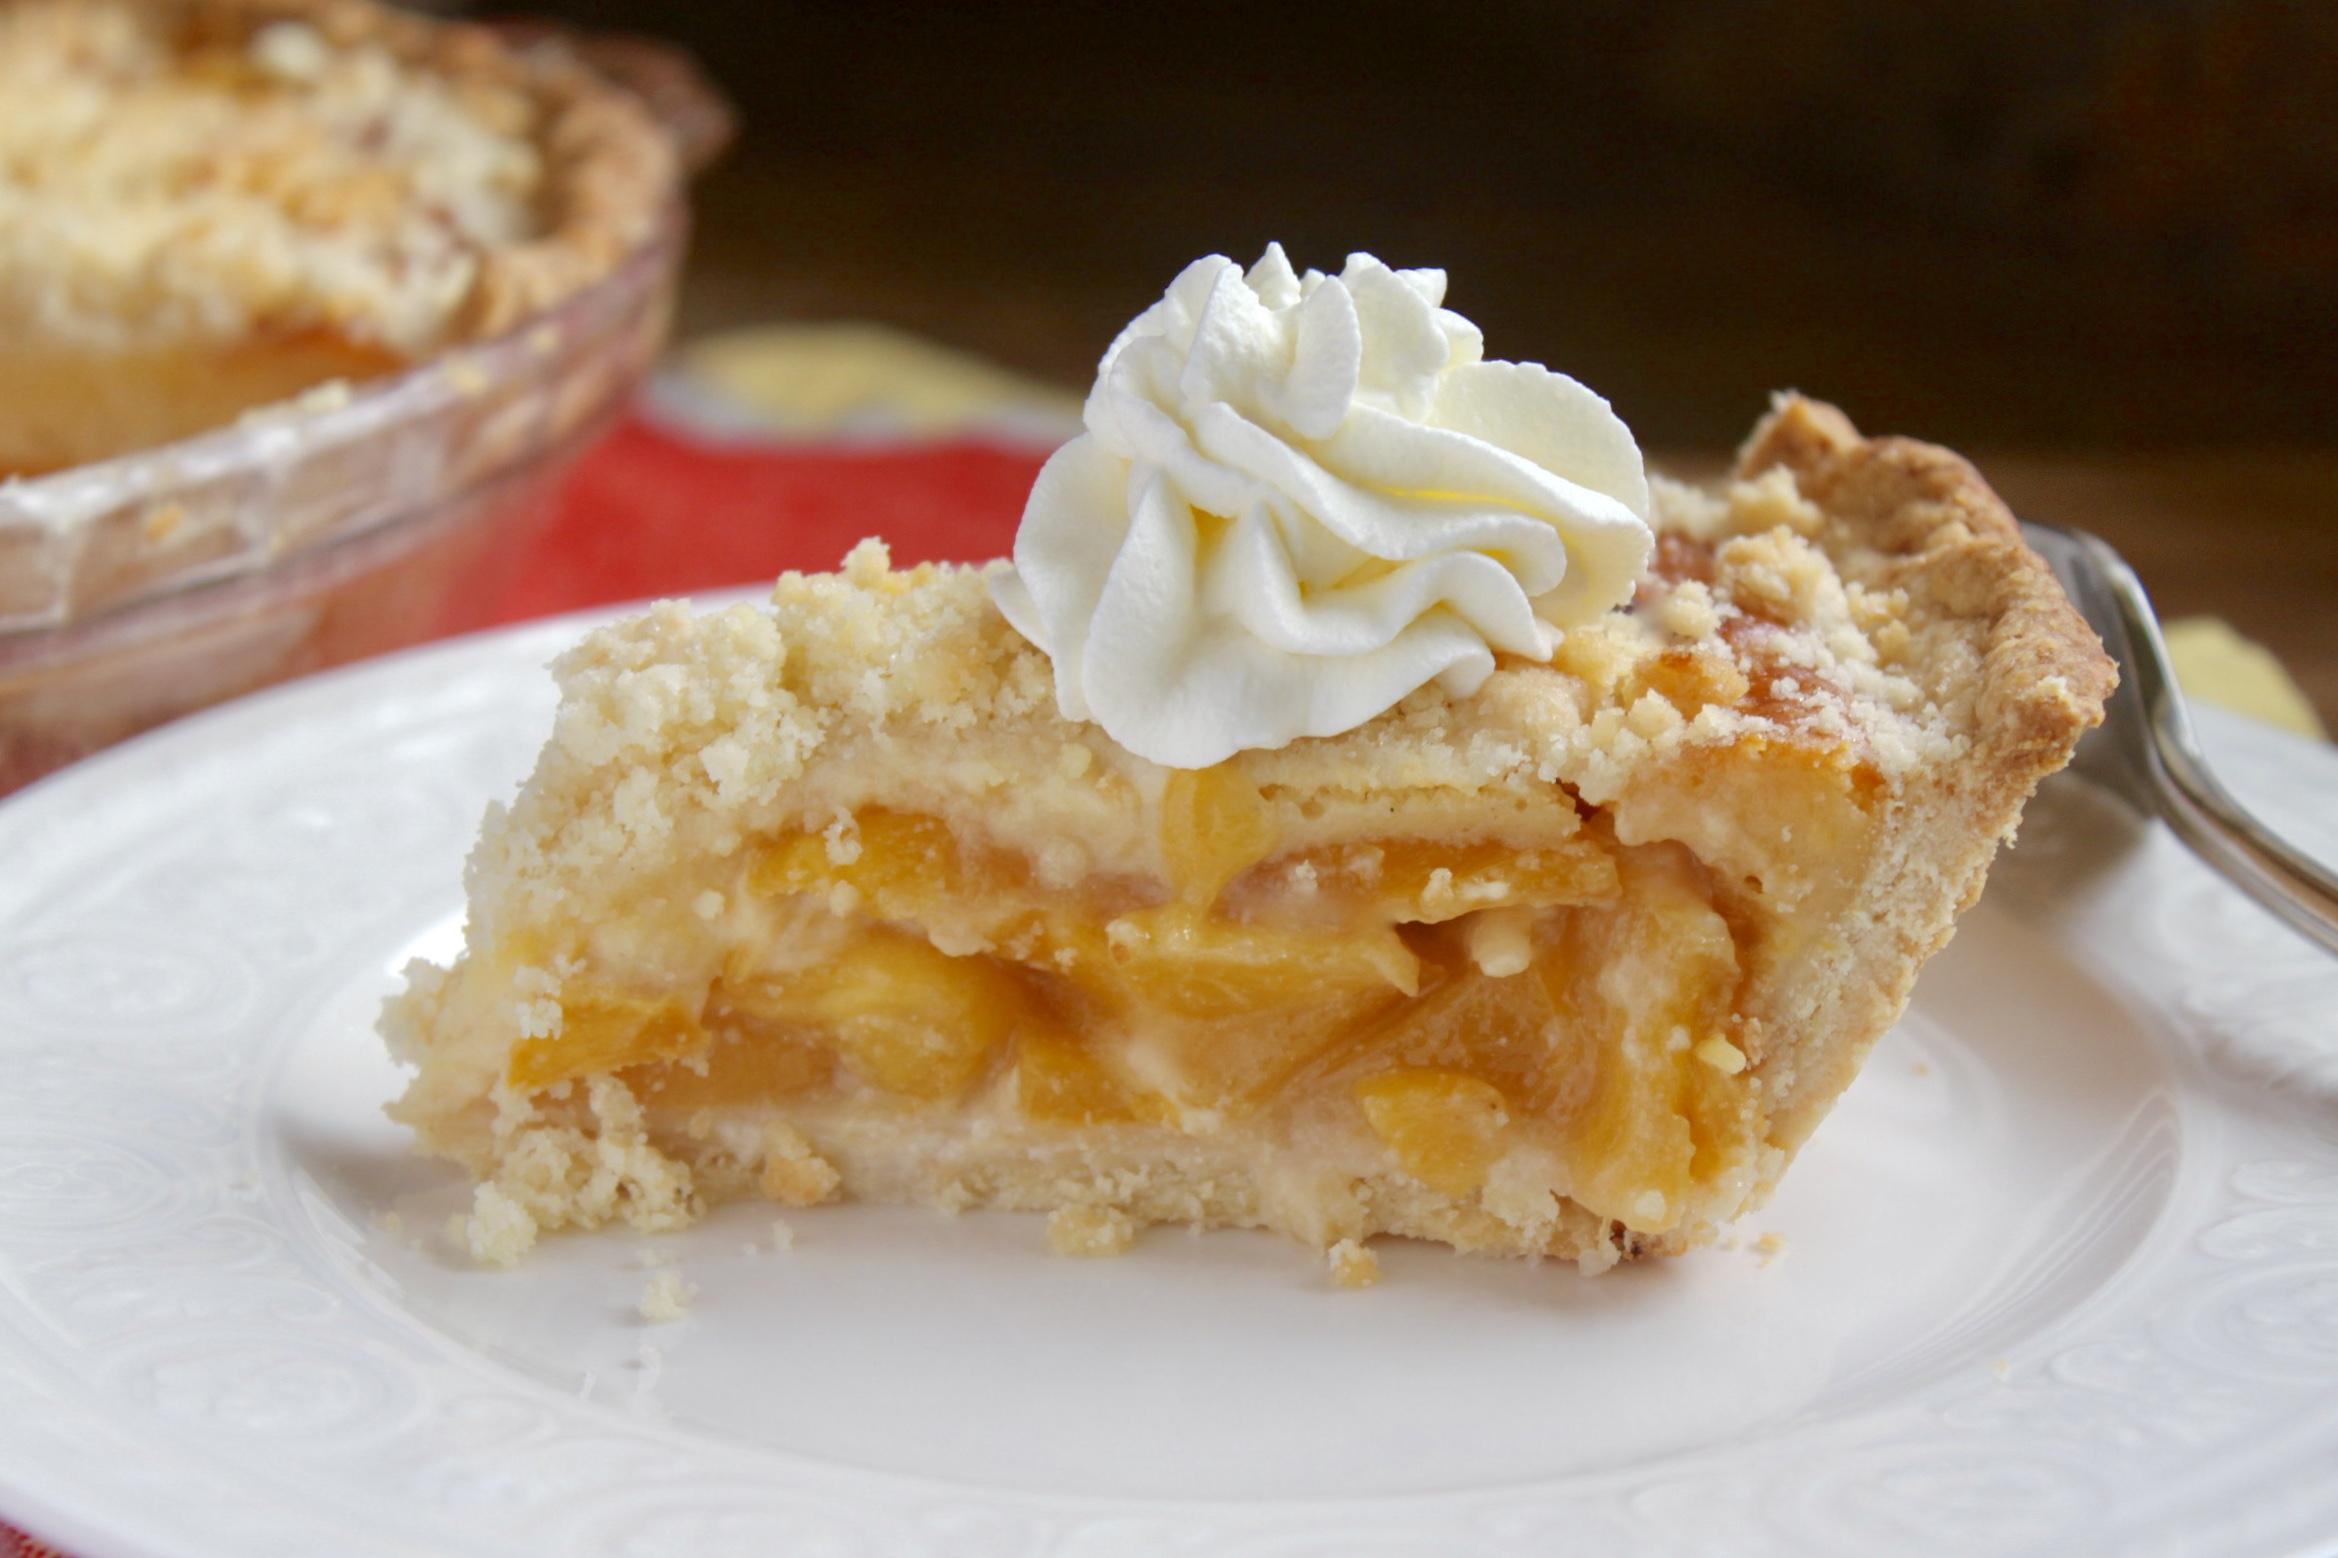 Slice of custard peach pie